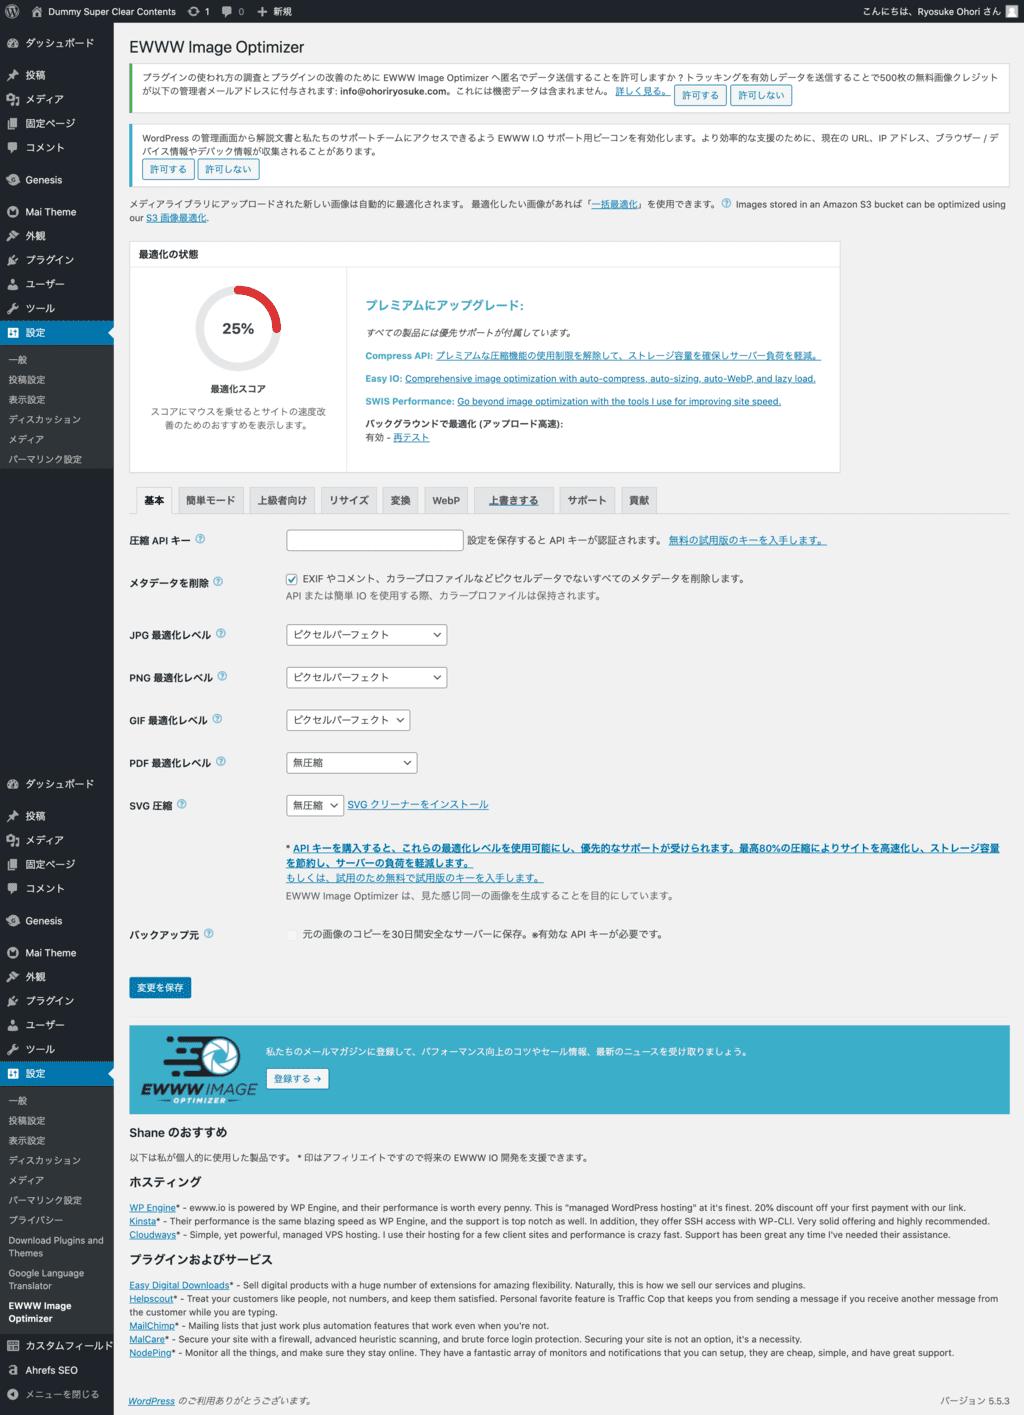 EWWW Image Optimizerの基本タブ設定